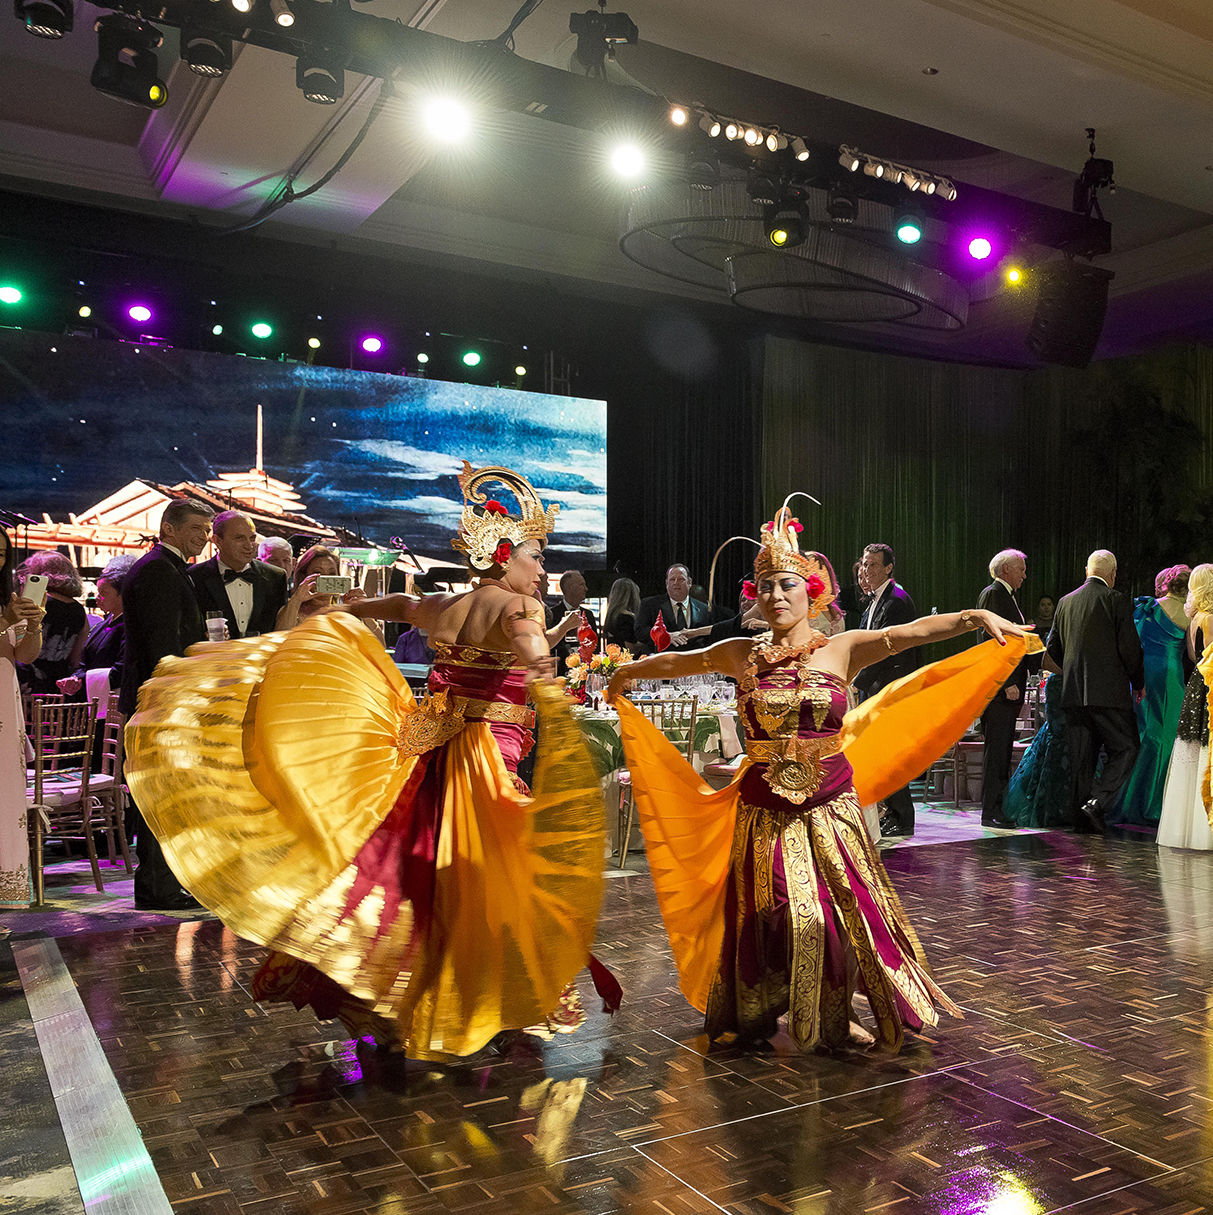 Dancers at the houston symphony ball  photo by anthony rathbun kqh9ve